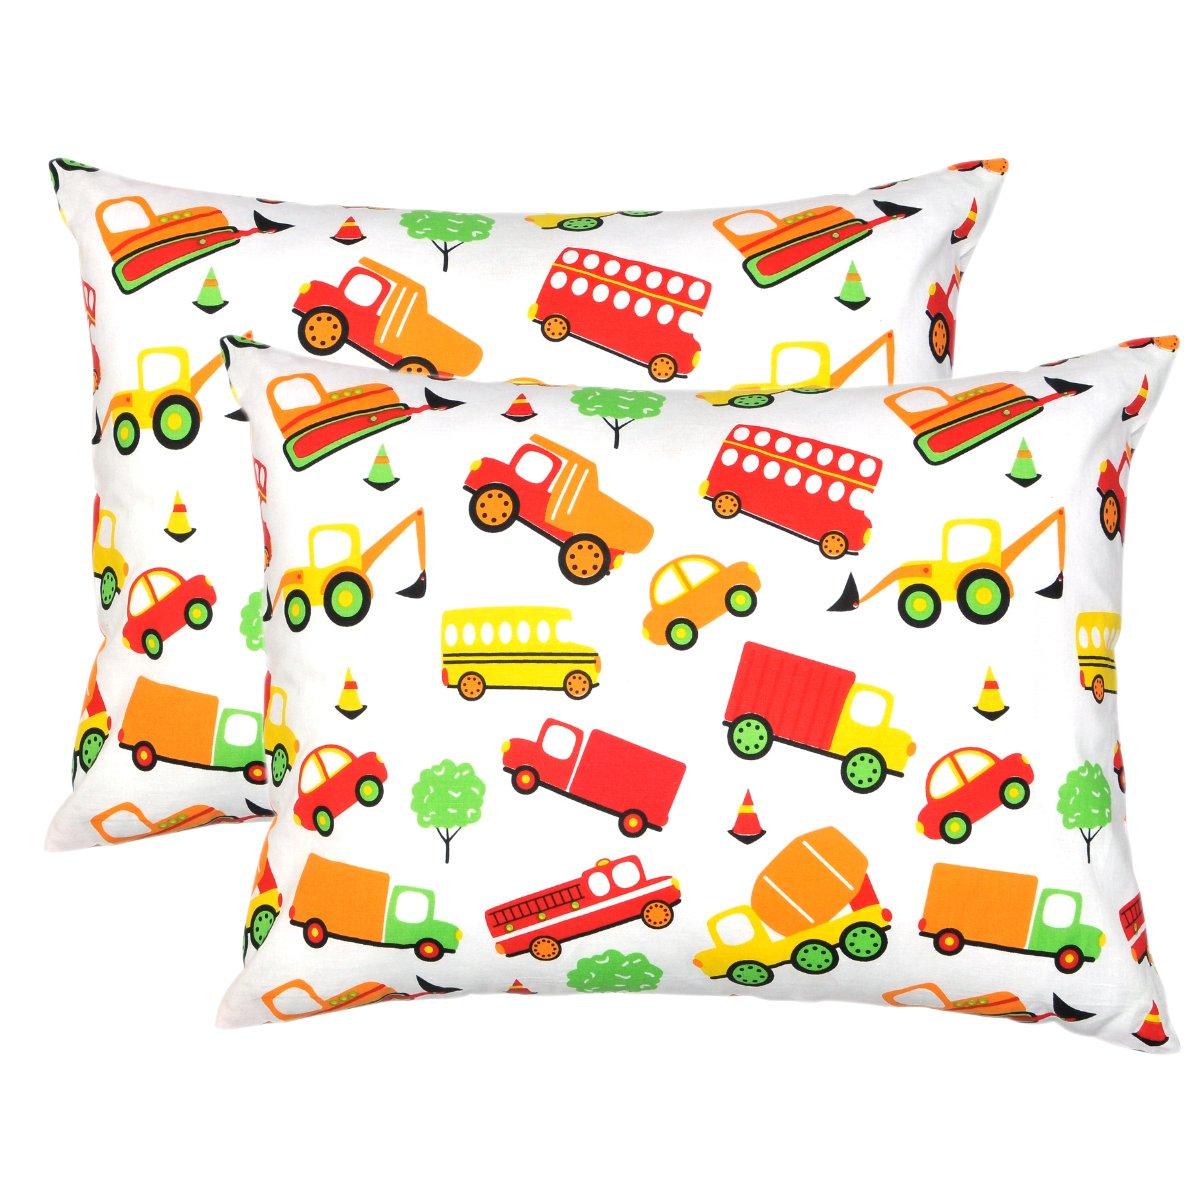 Mellanni Toddler Pillowcase Set Cars - Pack of 2 Toddler Size 14